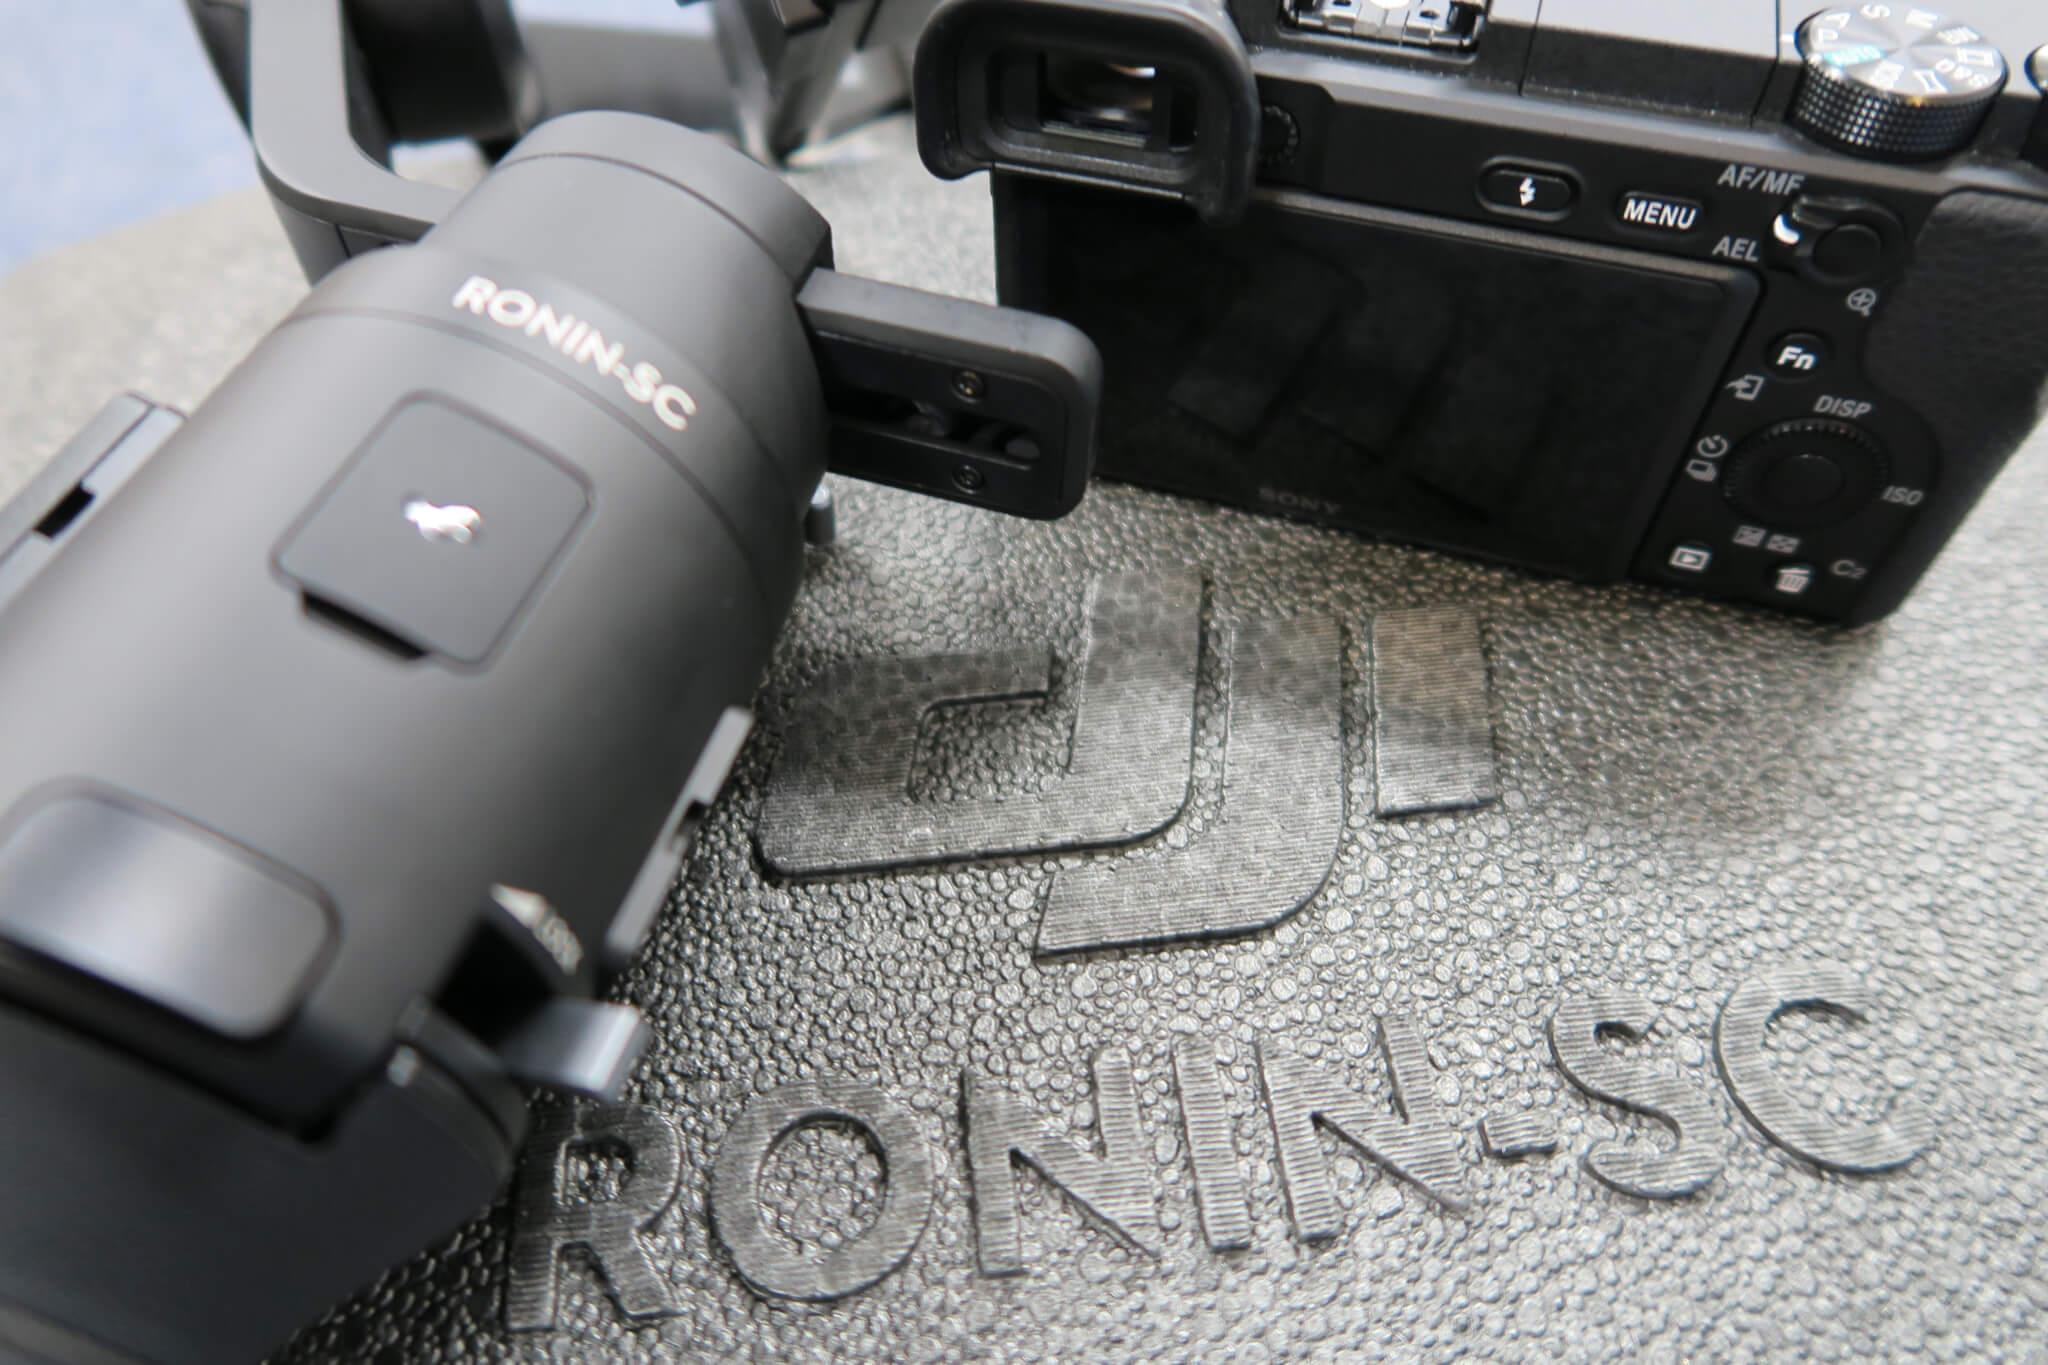 DJI Ronin-SC Proコンボ開封レビュー。その特徴と使用前の準備を徹底解説